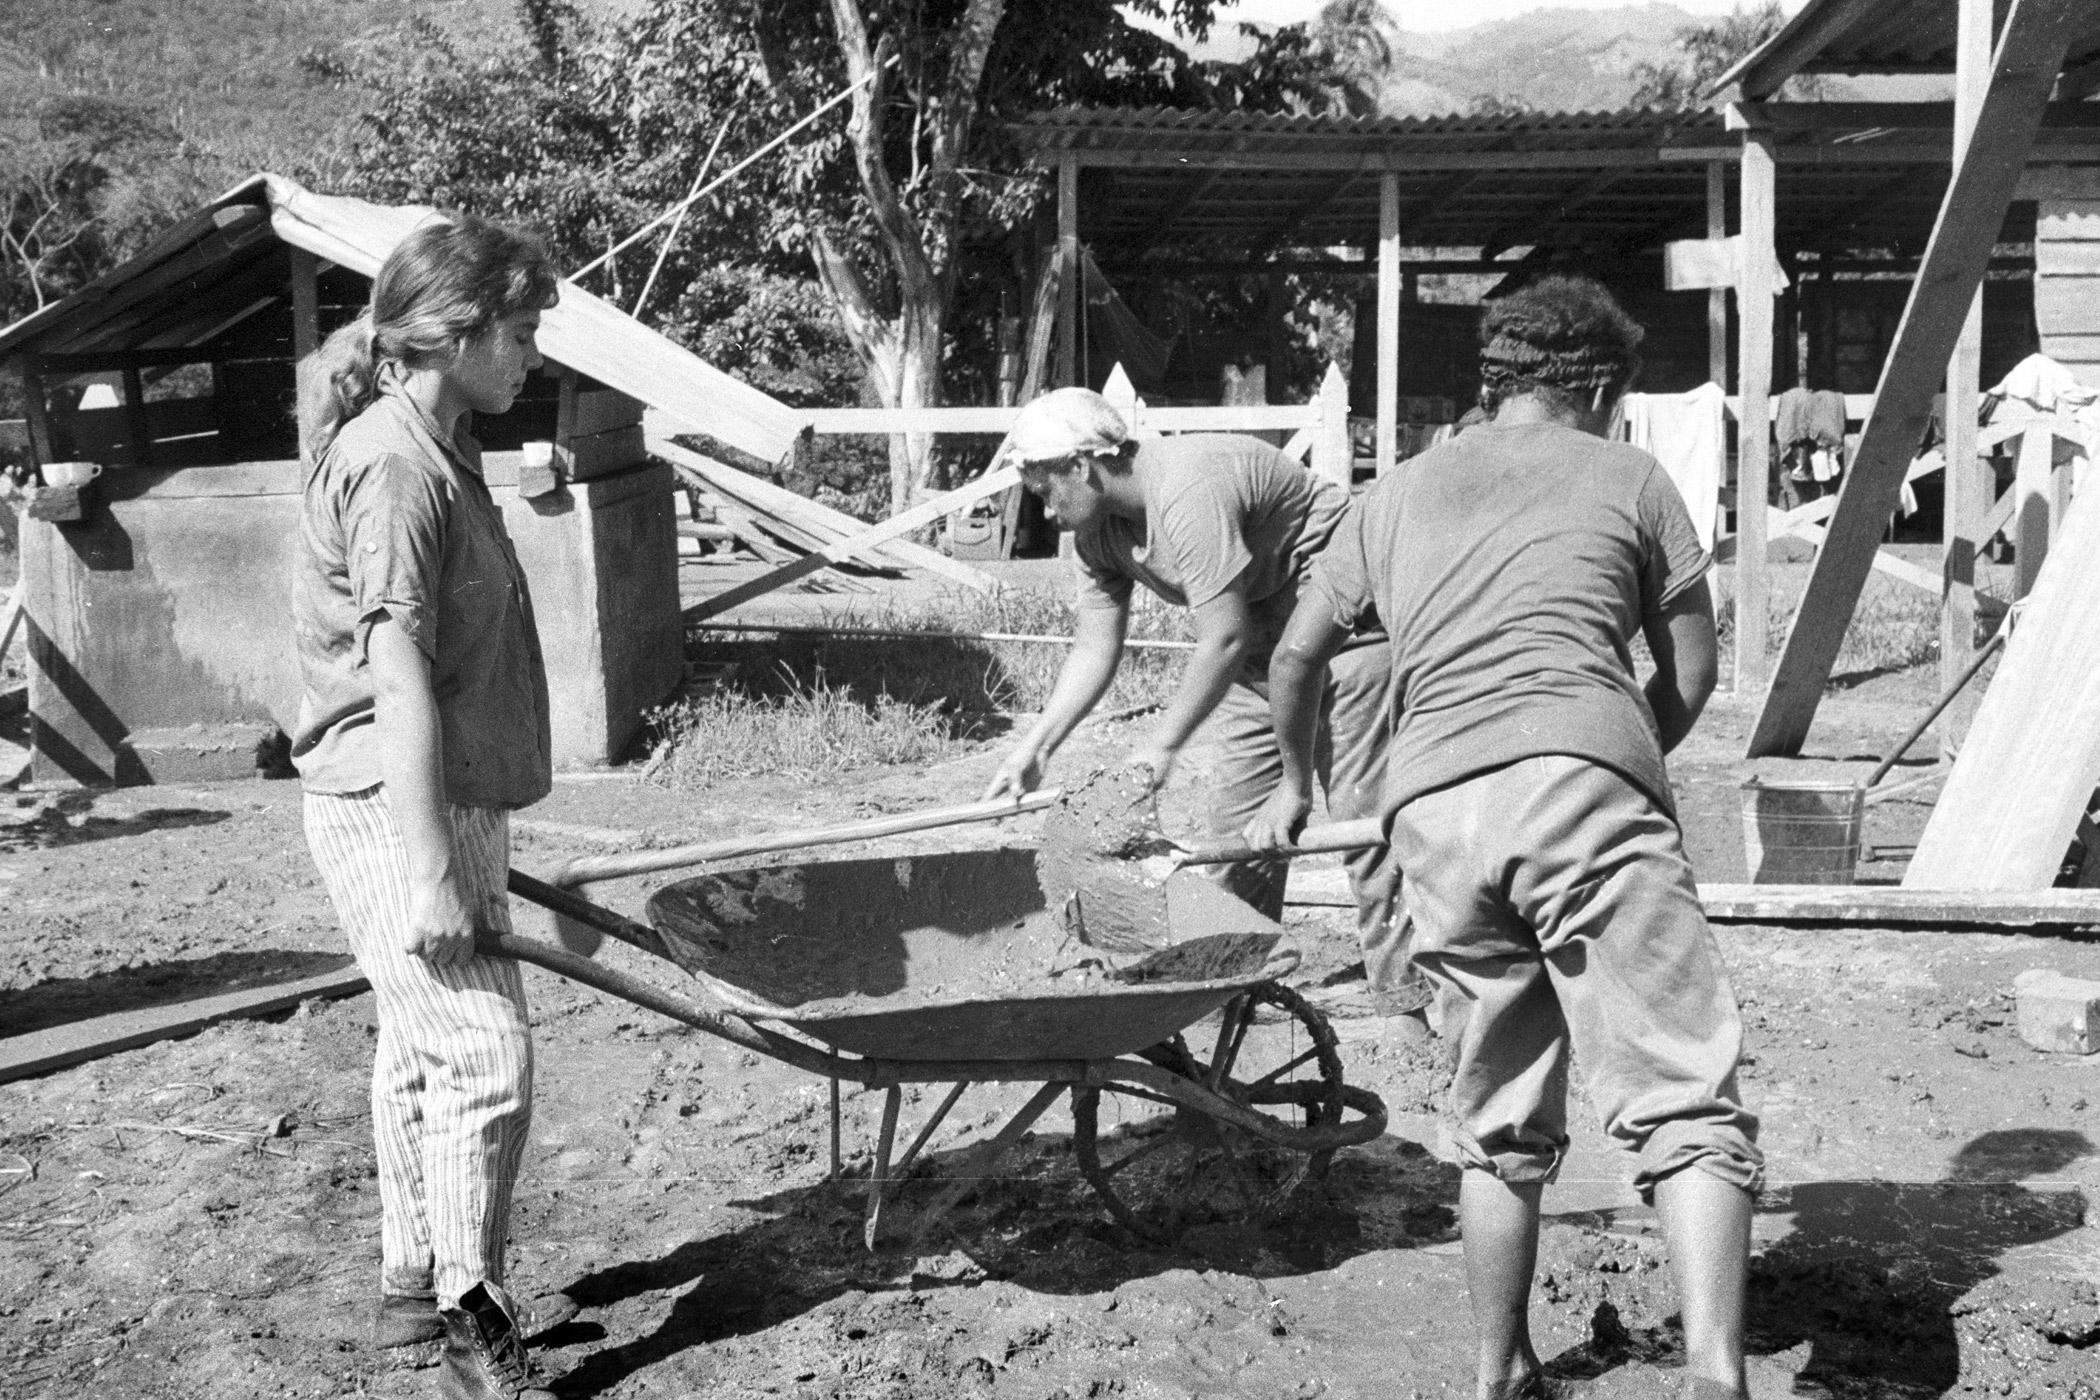 Women work at the Mariana Grajales brigade in Sierra Maestra, Cuba on July 26, 1960.